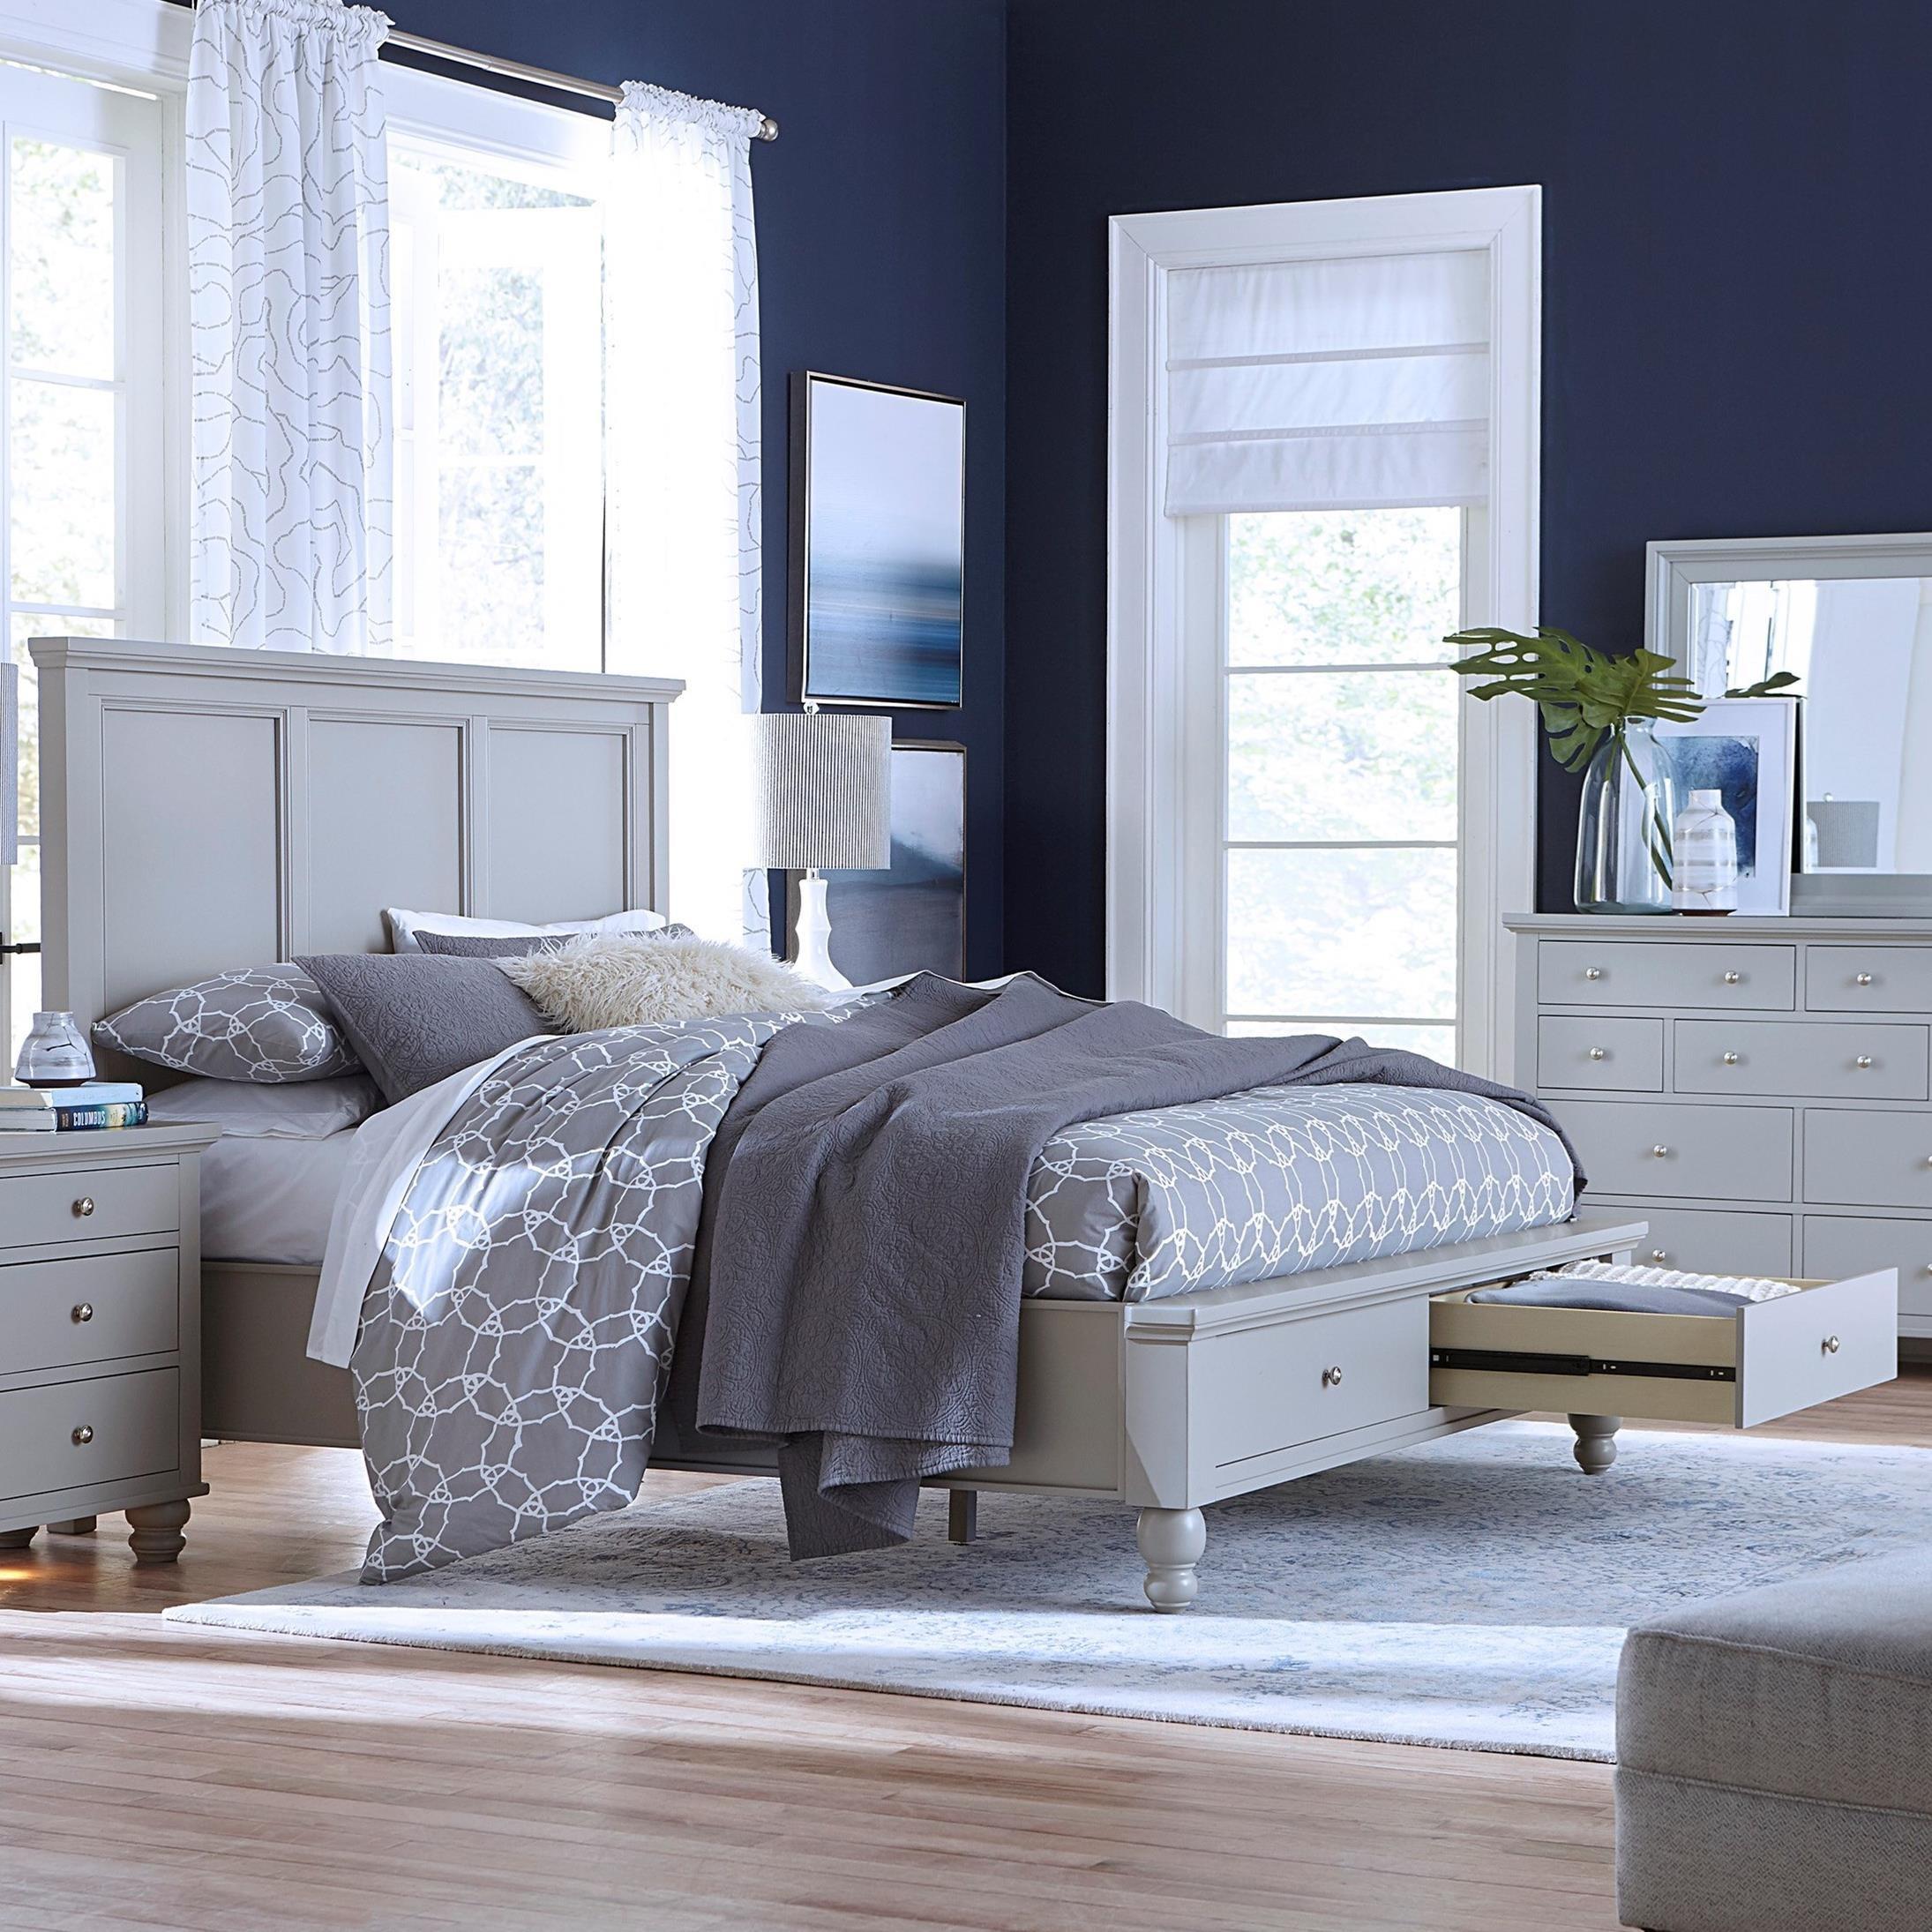 Home Bedroom Furniture Panel Beds Aspen Cambridge Queen Panel Bed. Aspen  CambridgeQueen Panel Bed